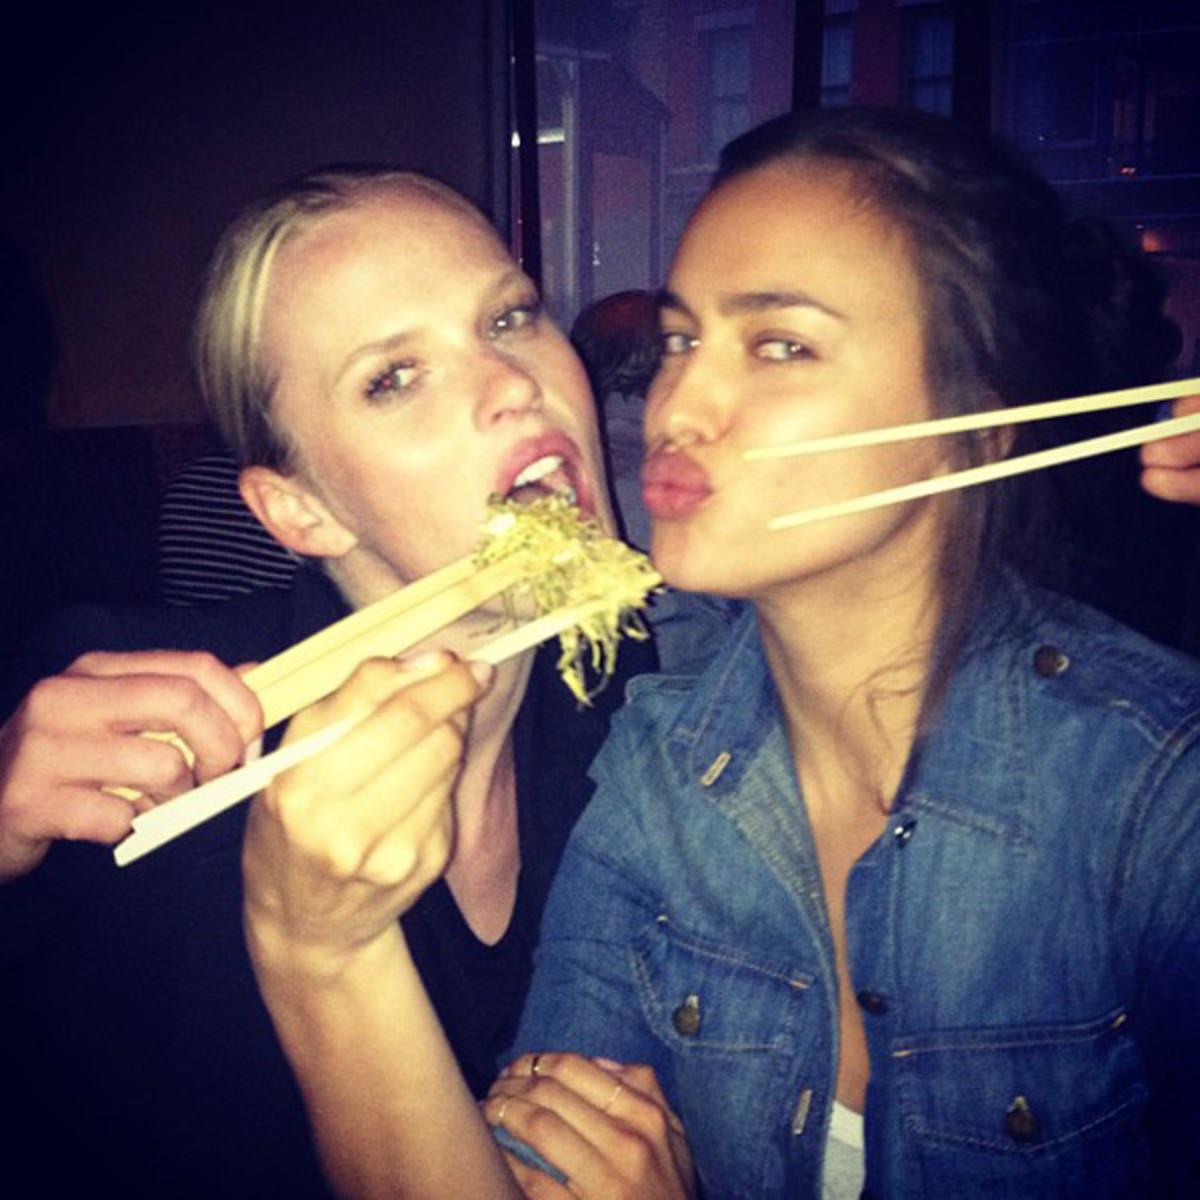 Anne V and Irina Shayk :: @annev_official